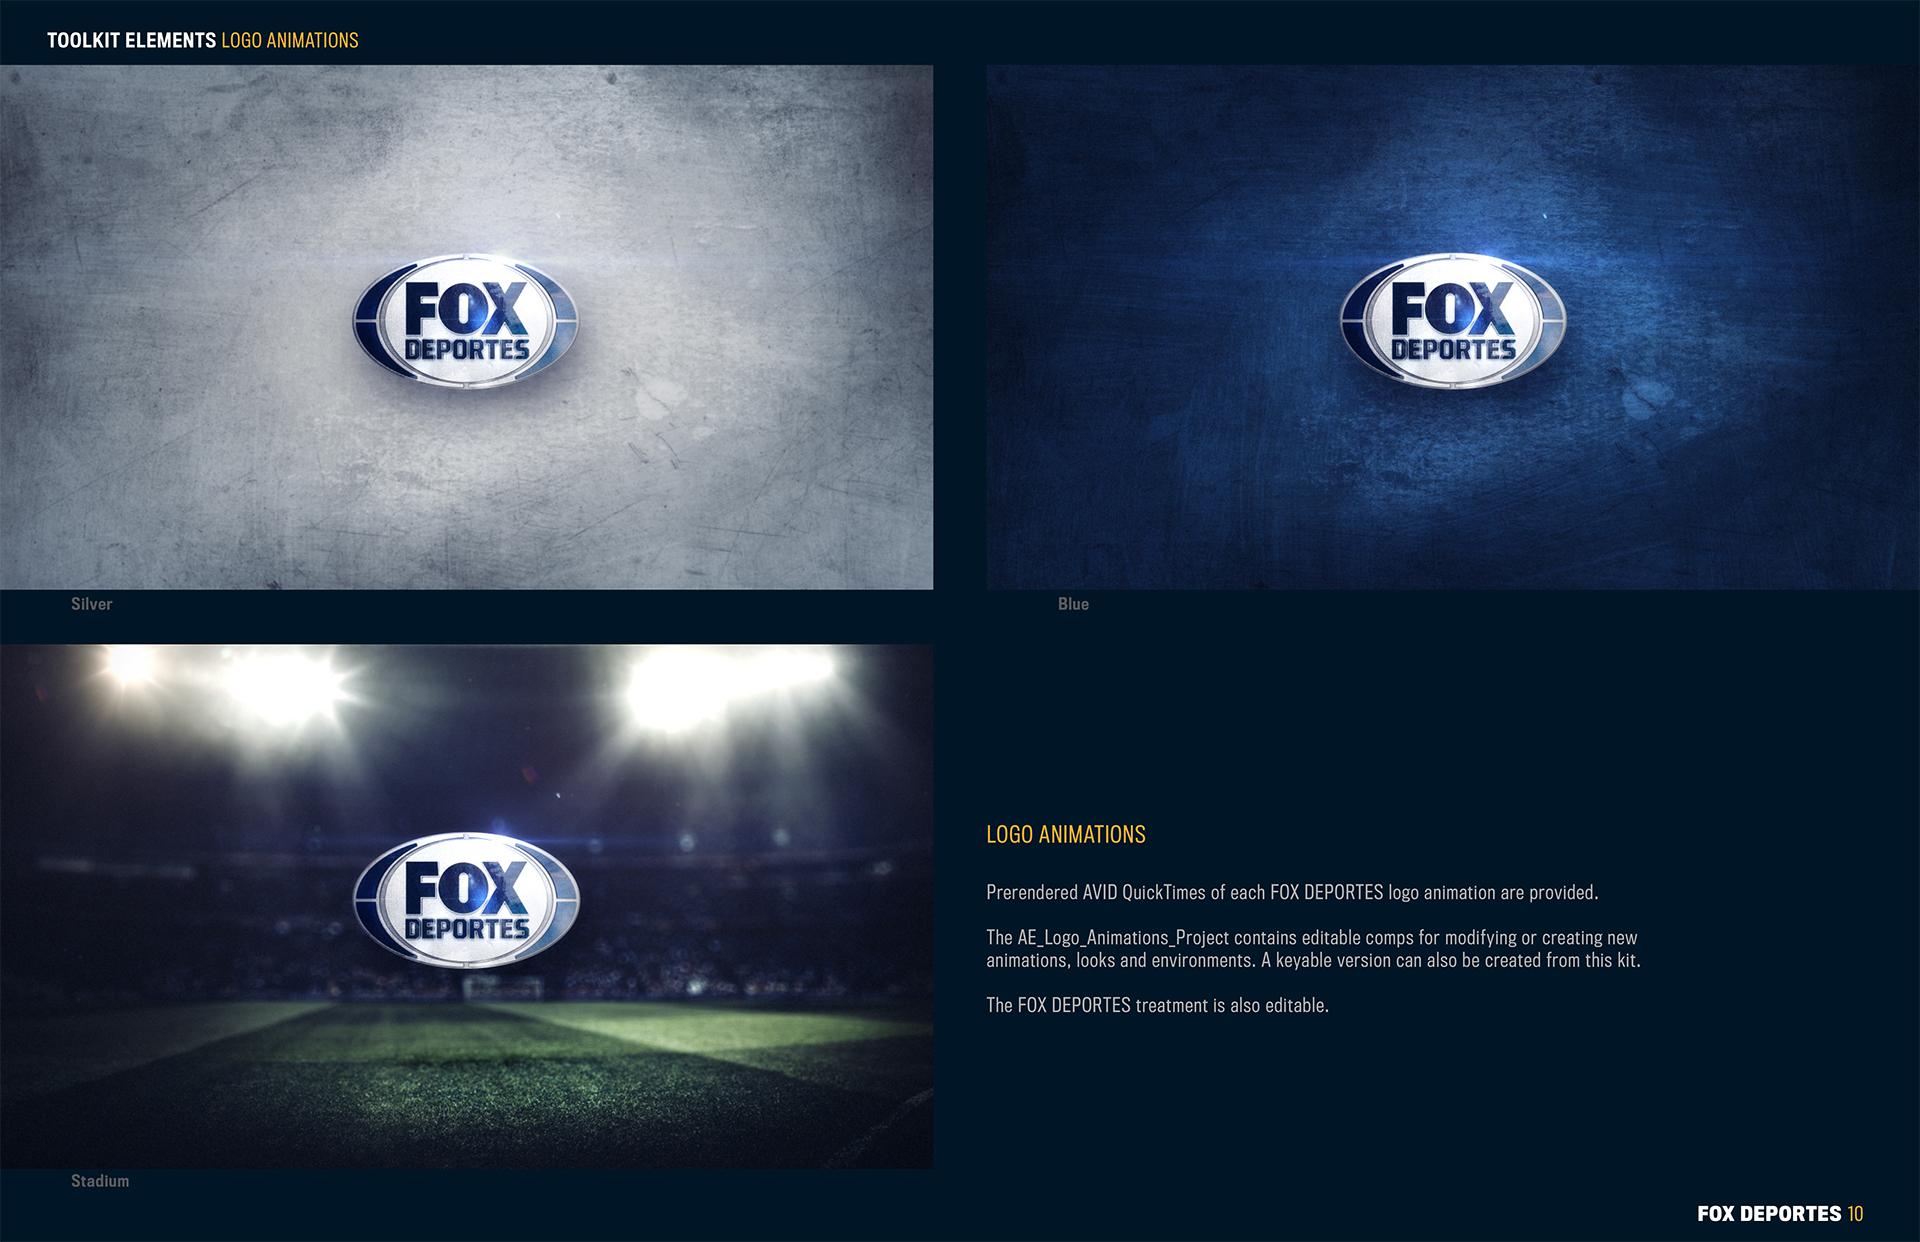 FOX_DEPORTES_Element_Guide_072314-10 copy.jpg